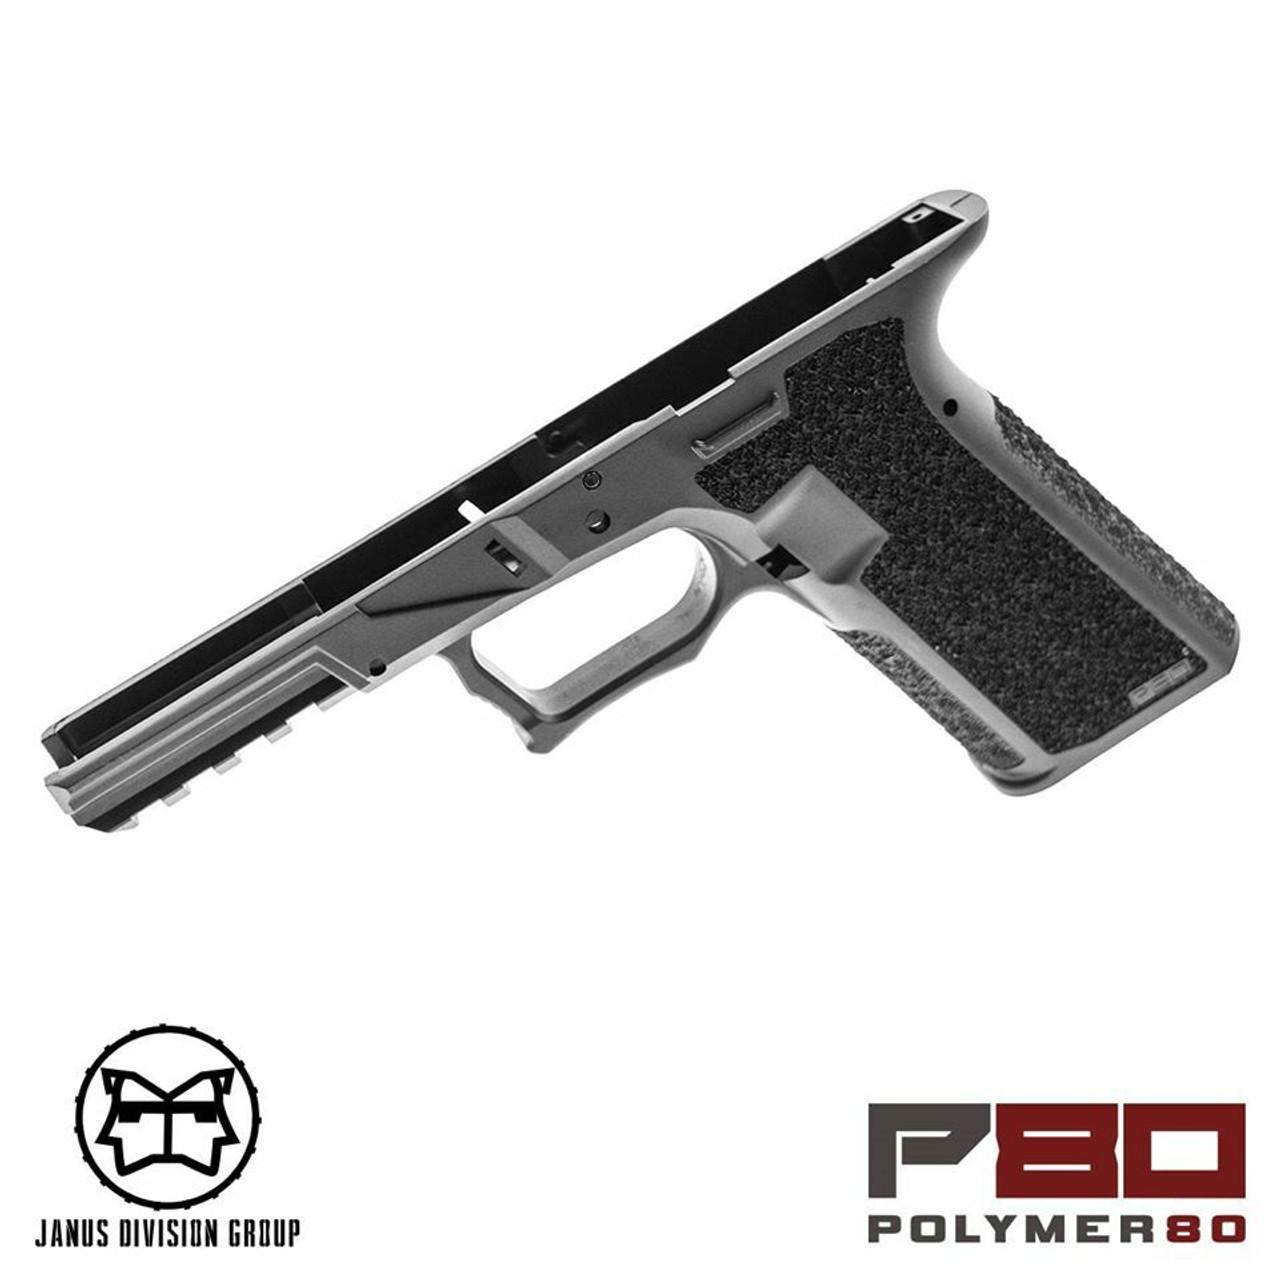 JDG P80 Frame for G17/18/22/34 Gen3 ( Umarex / Marui / WE ) - Grey